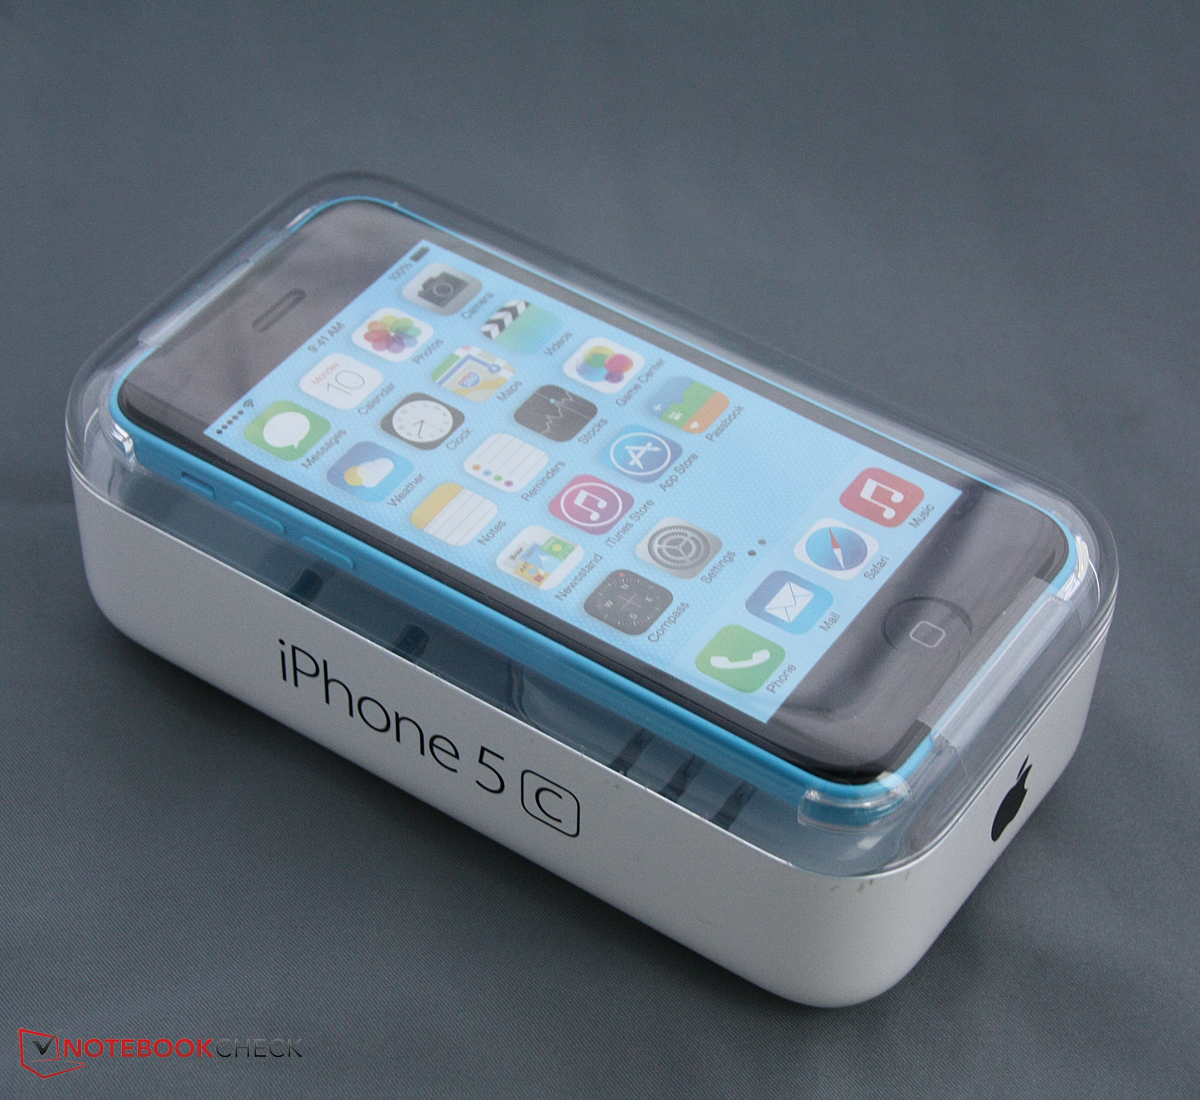 IPhone 5S Ceny ji od 4800 IPhone 5S - Velk slevy na model 5S - Kup hned